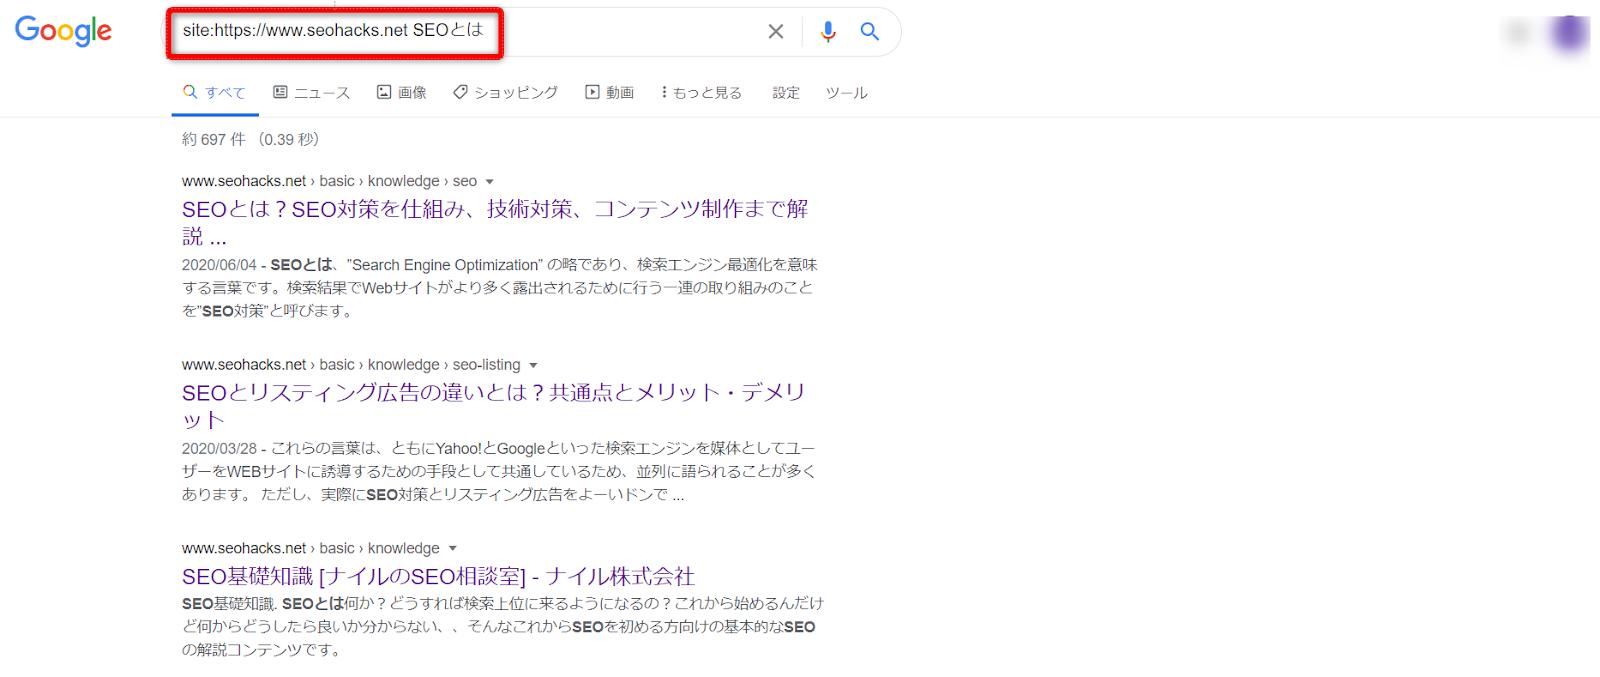 「site:https://www.seohacks.net SEOとは」のsite検索のスクリーンショット